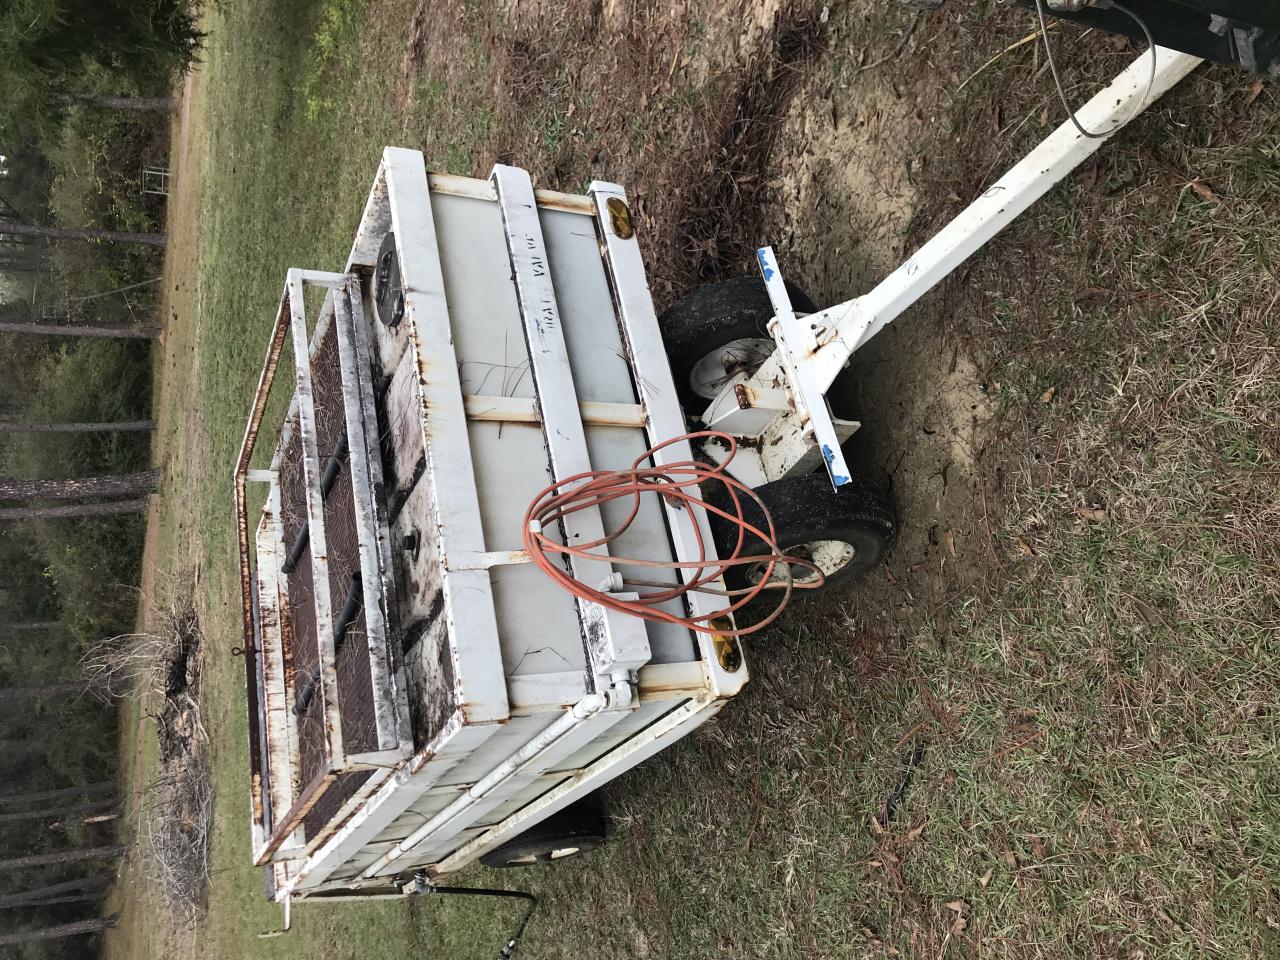 Water pump cart-c003d67b-d32a-41bb-bfee-5acdffd5a7d1-jpg